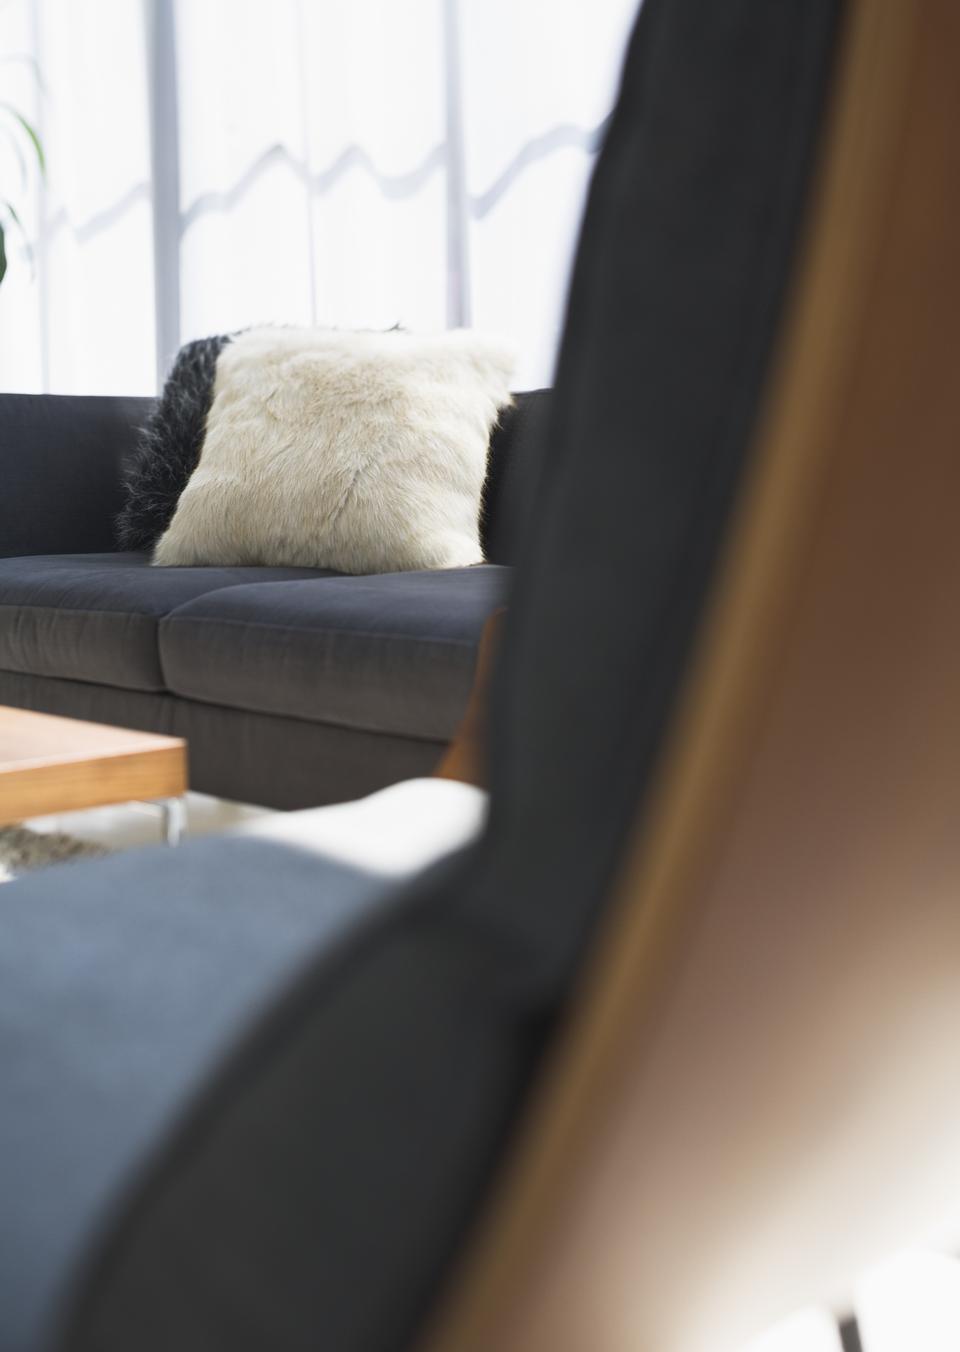 Decorative pillows on a casual sofa